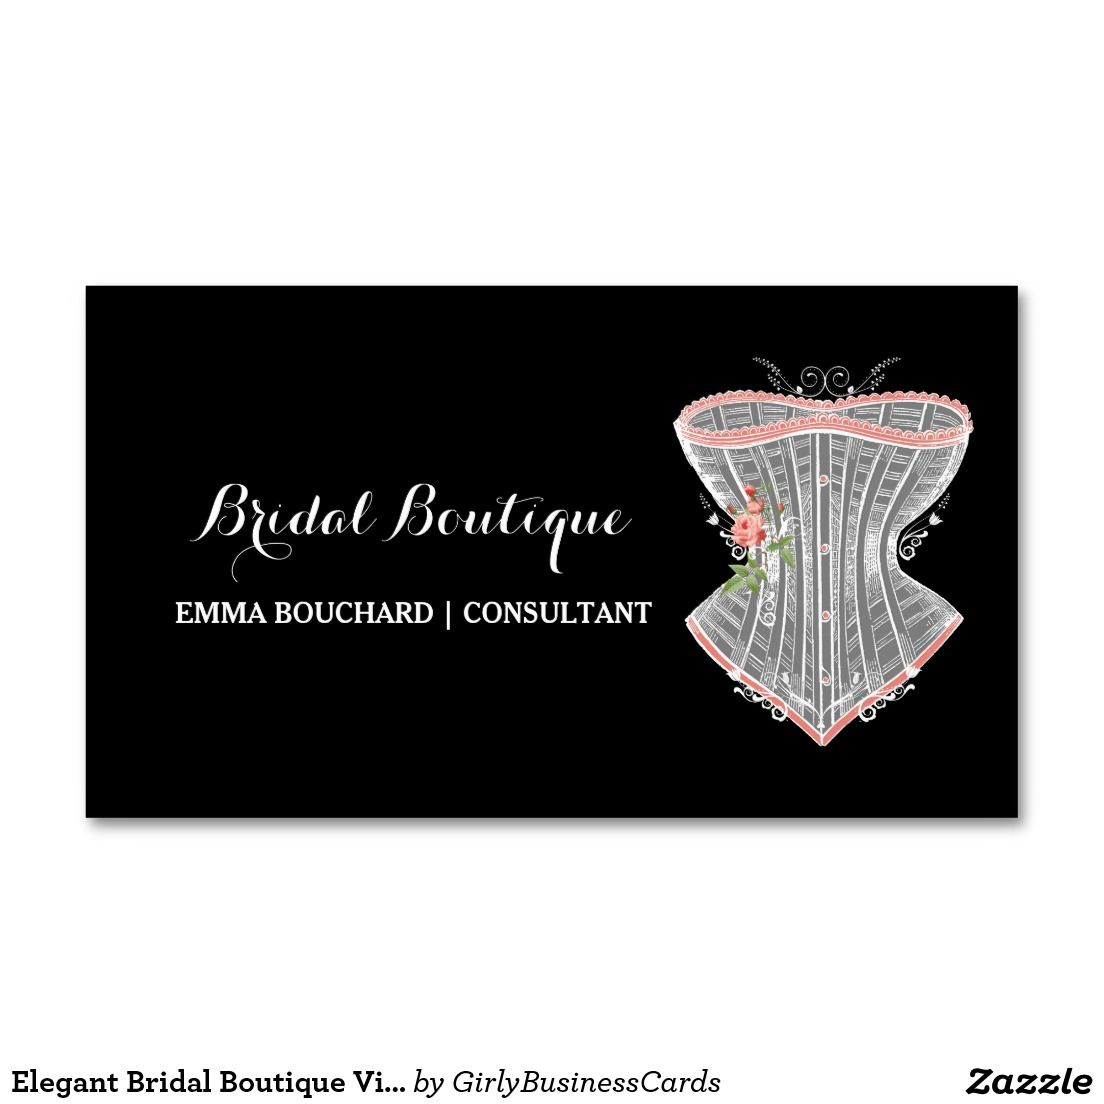 Elegant bridal boutique vintage corset lingerie business card elegant bridal boutique vintage corset lingerie double sided standard business cards pack of 100 reheart Gallery